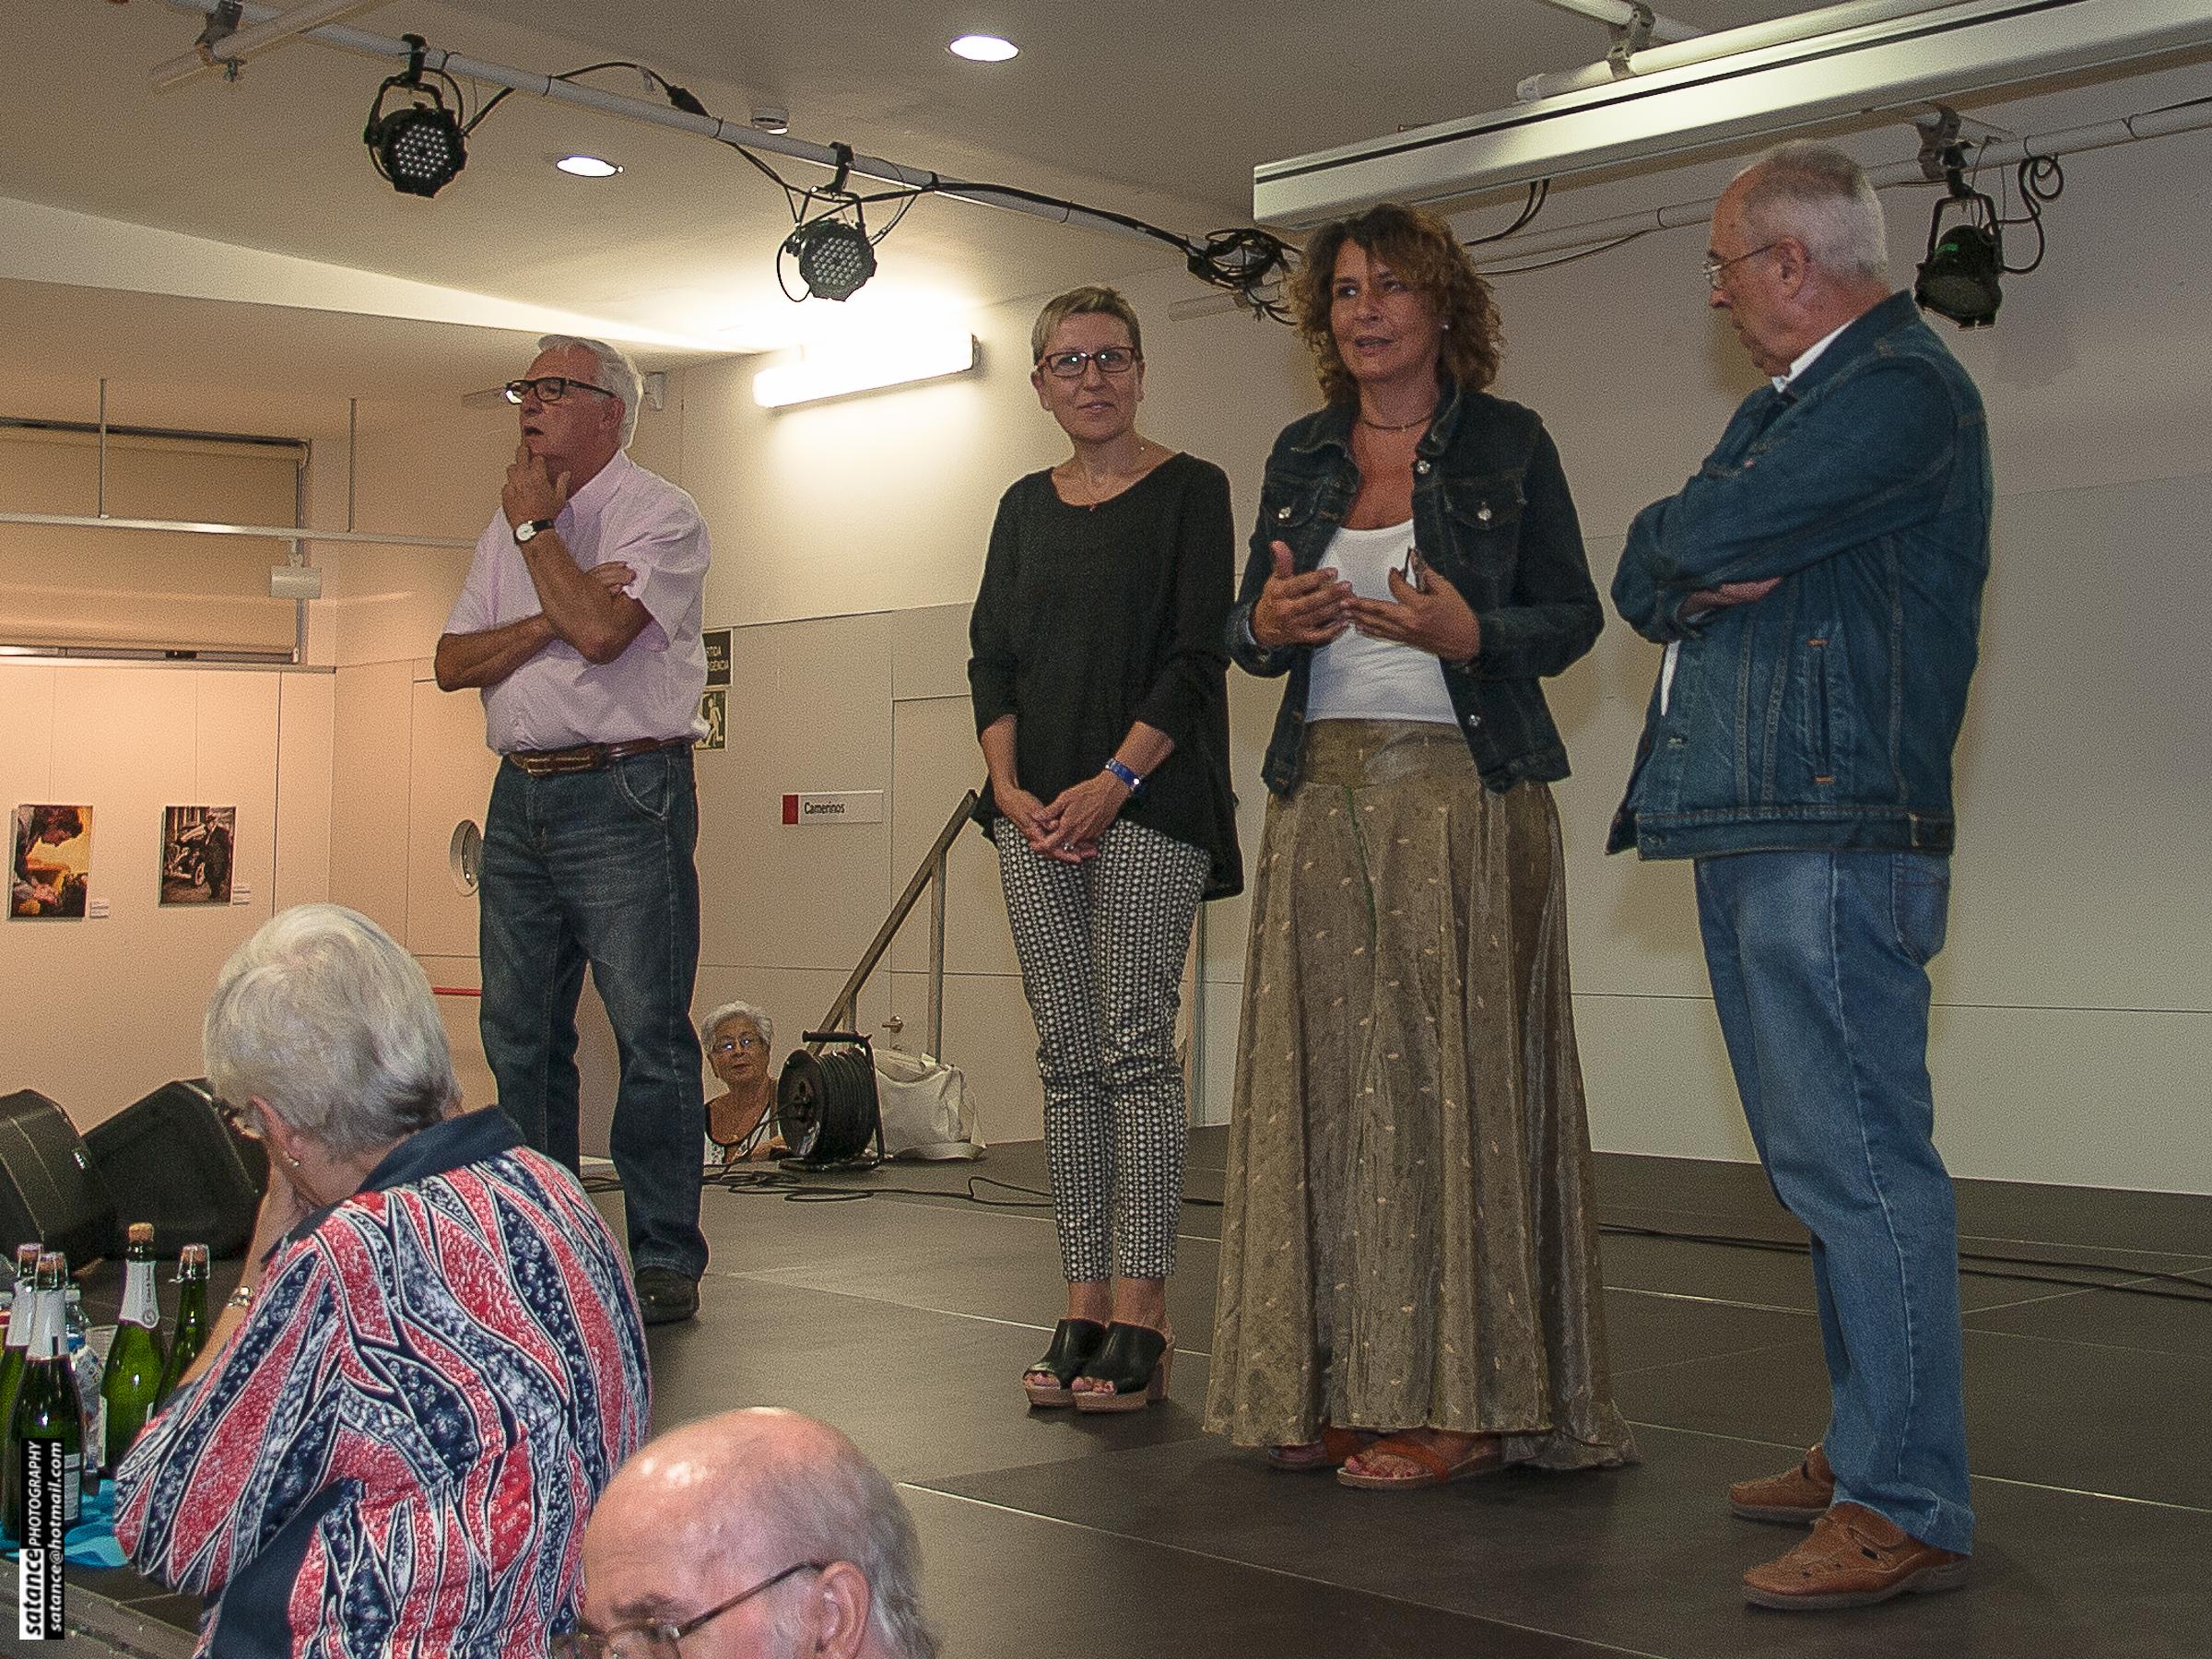 Pere Fernández, Carmen Andrés, Montse Benedí, Salvador Atance